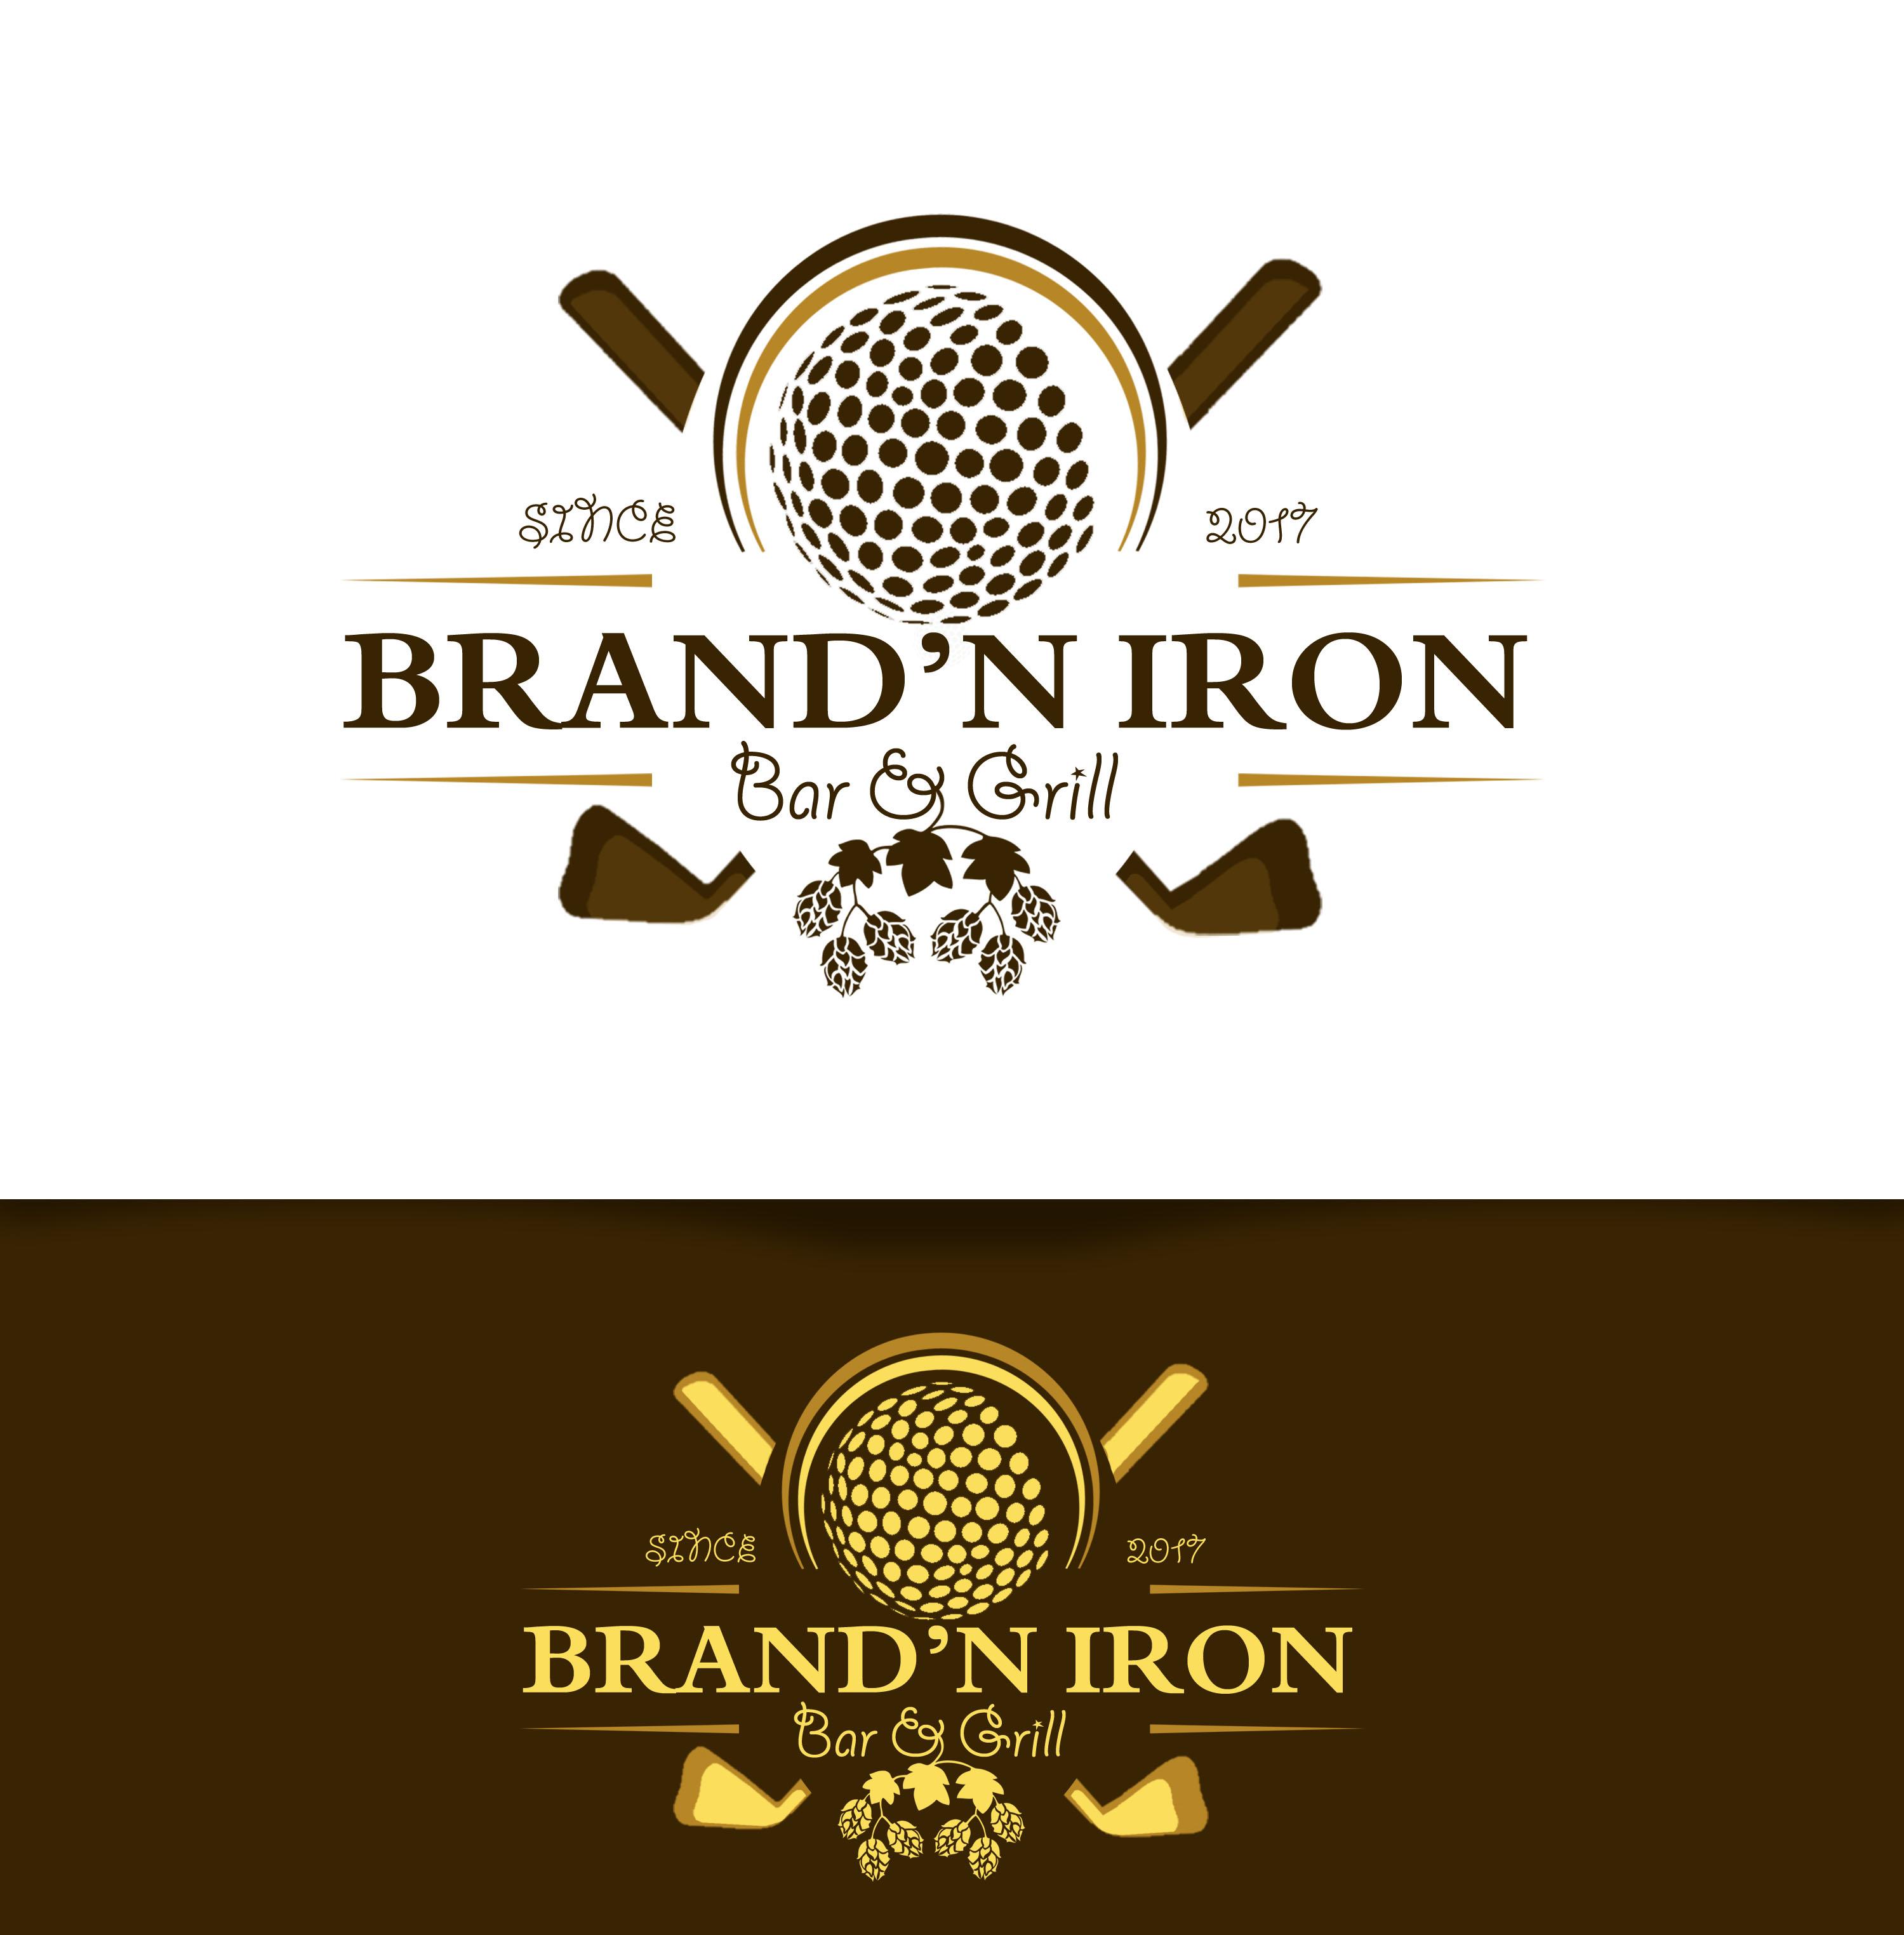 Logo Design by JSDESIGNGROUP - Entry No. 178 in the Logo Design Contest Captivating Logo Design for Brand'n Iron Bar & Grill.